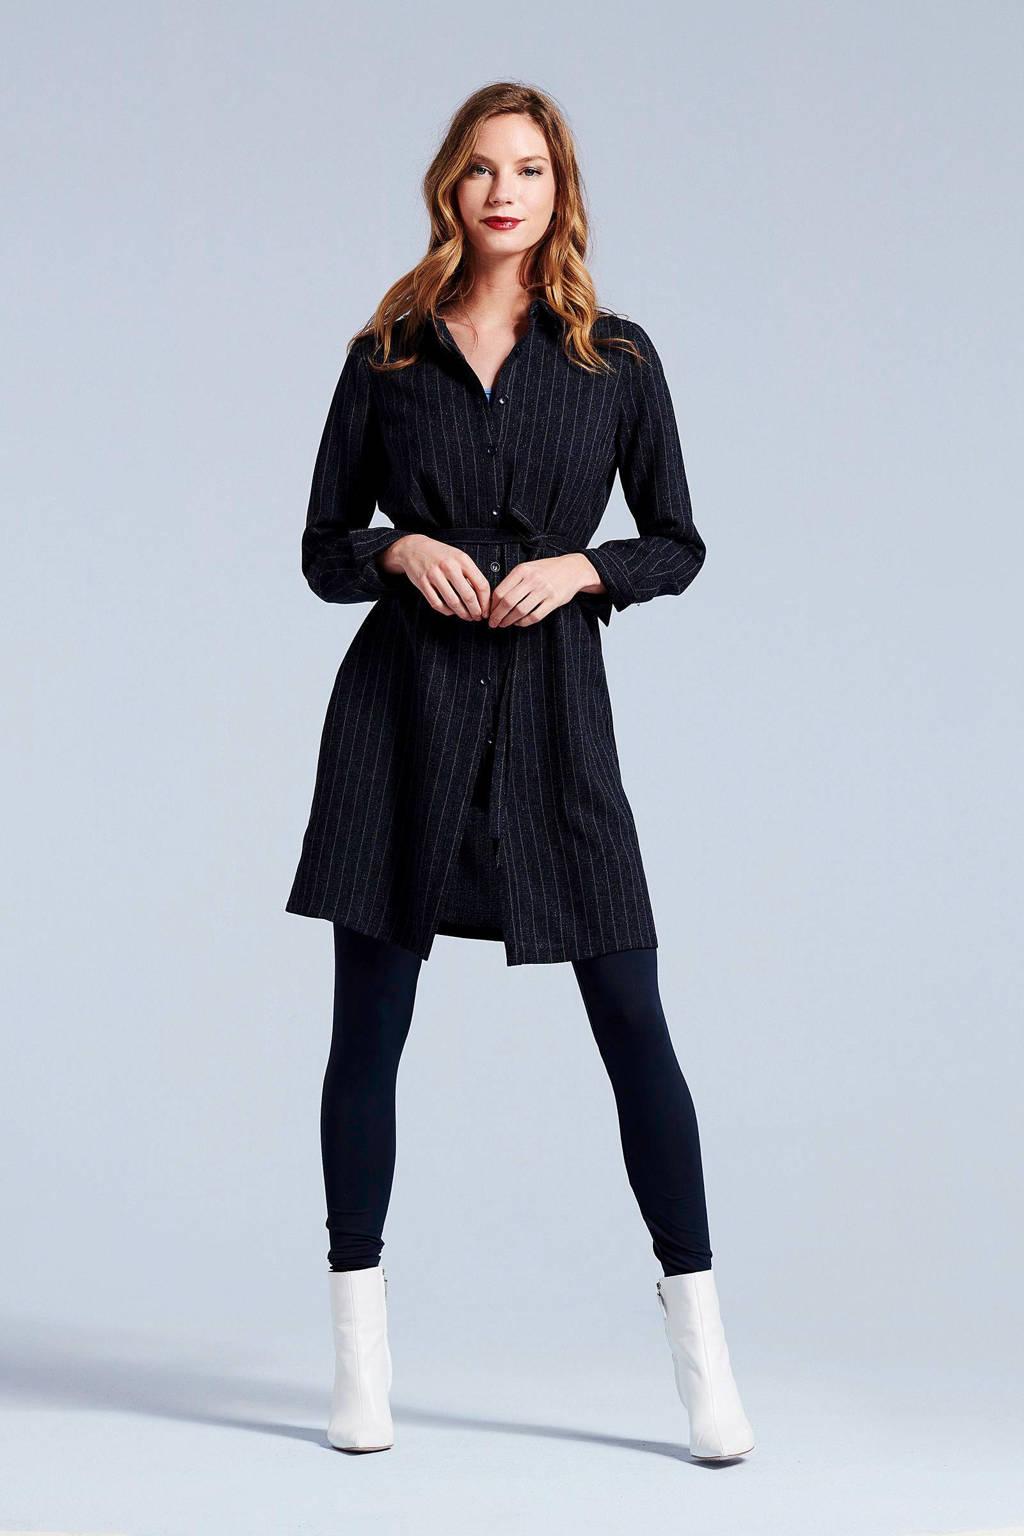 Didi blousejurk met krijtstreep dessin, Dark denim